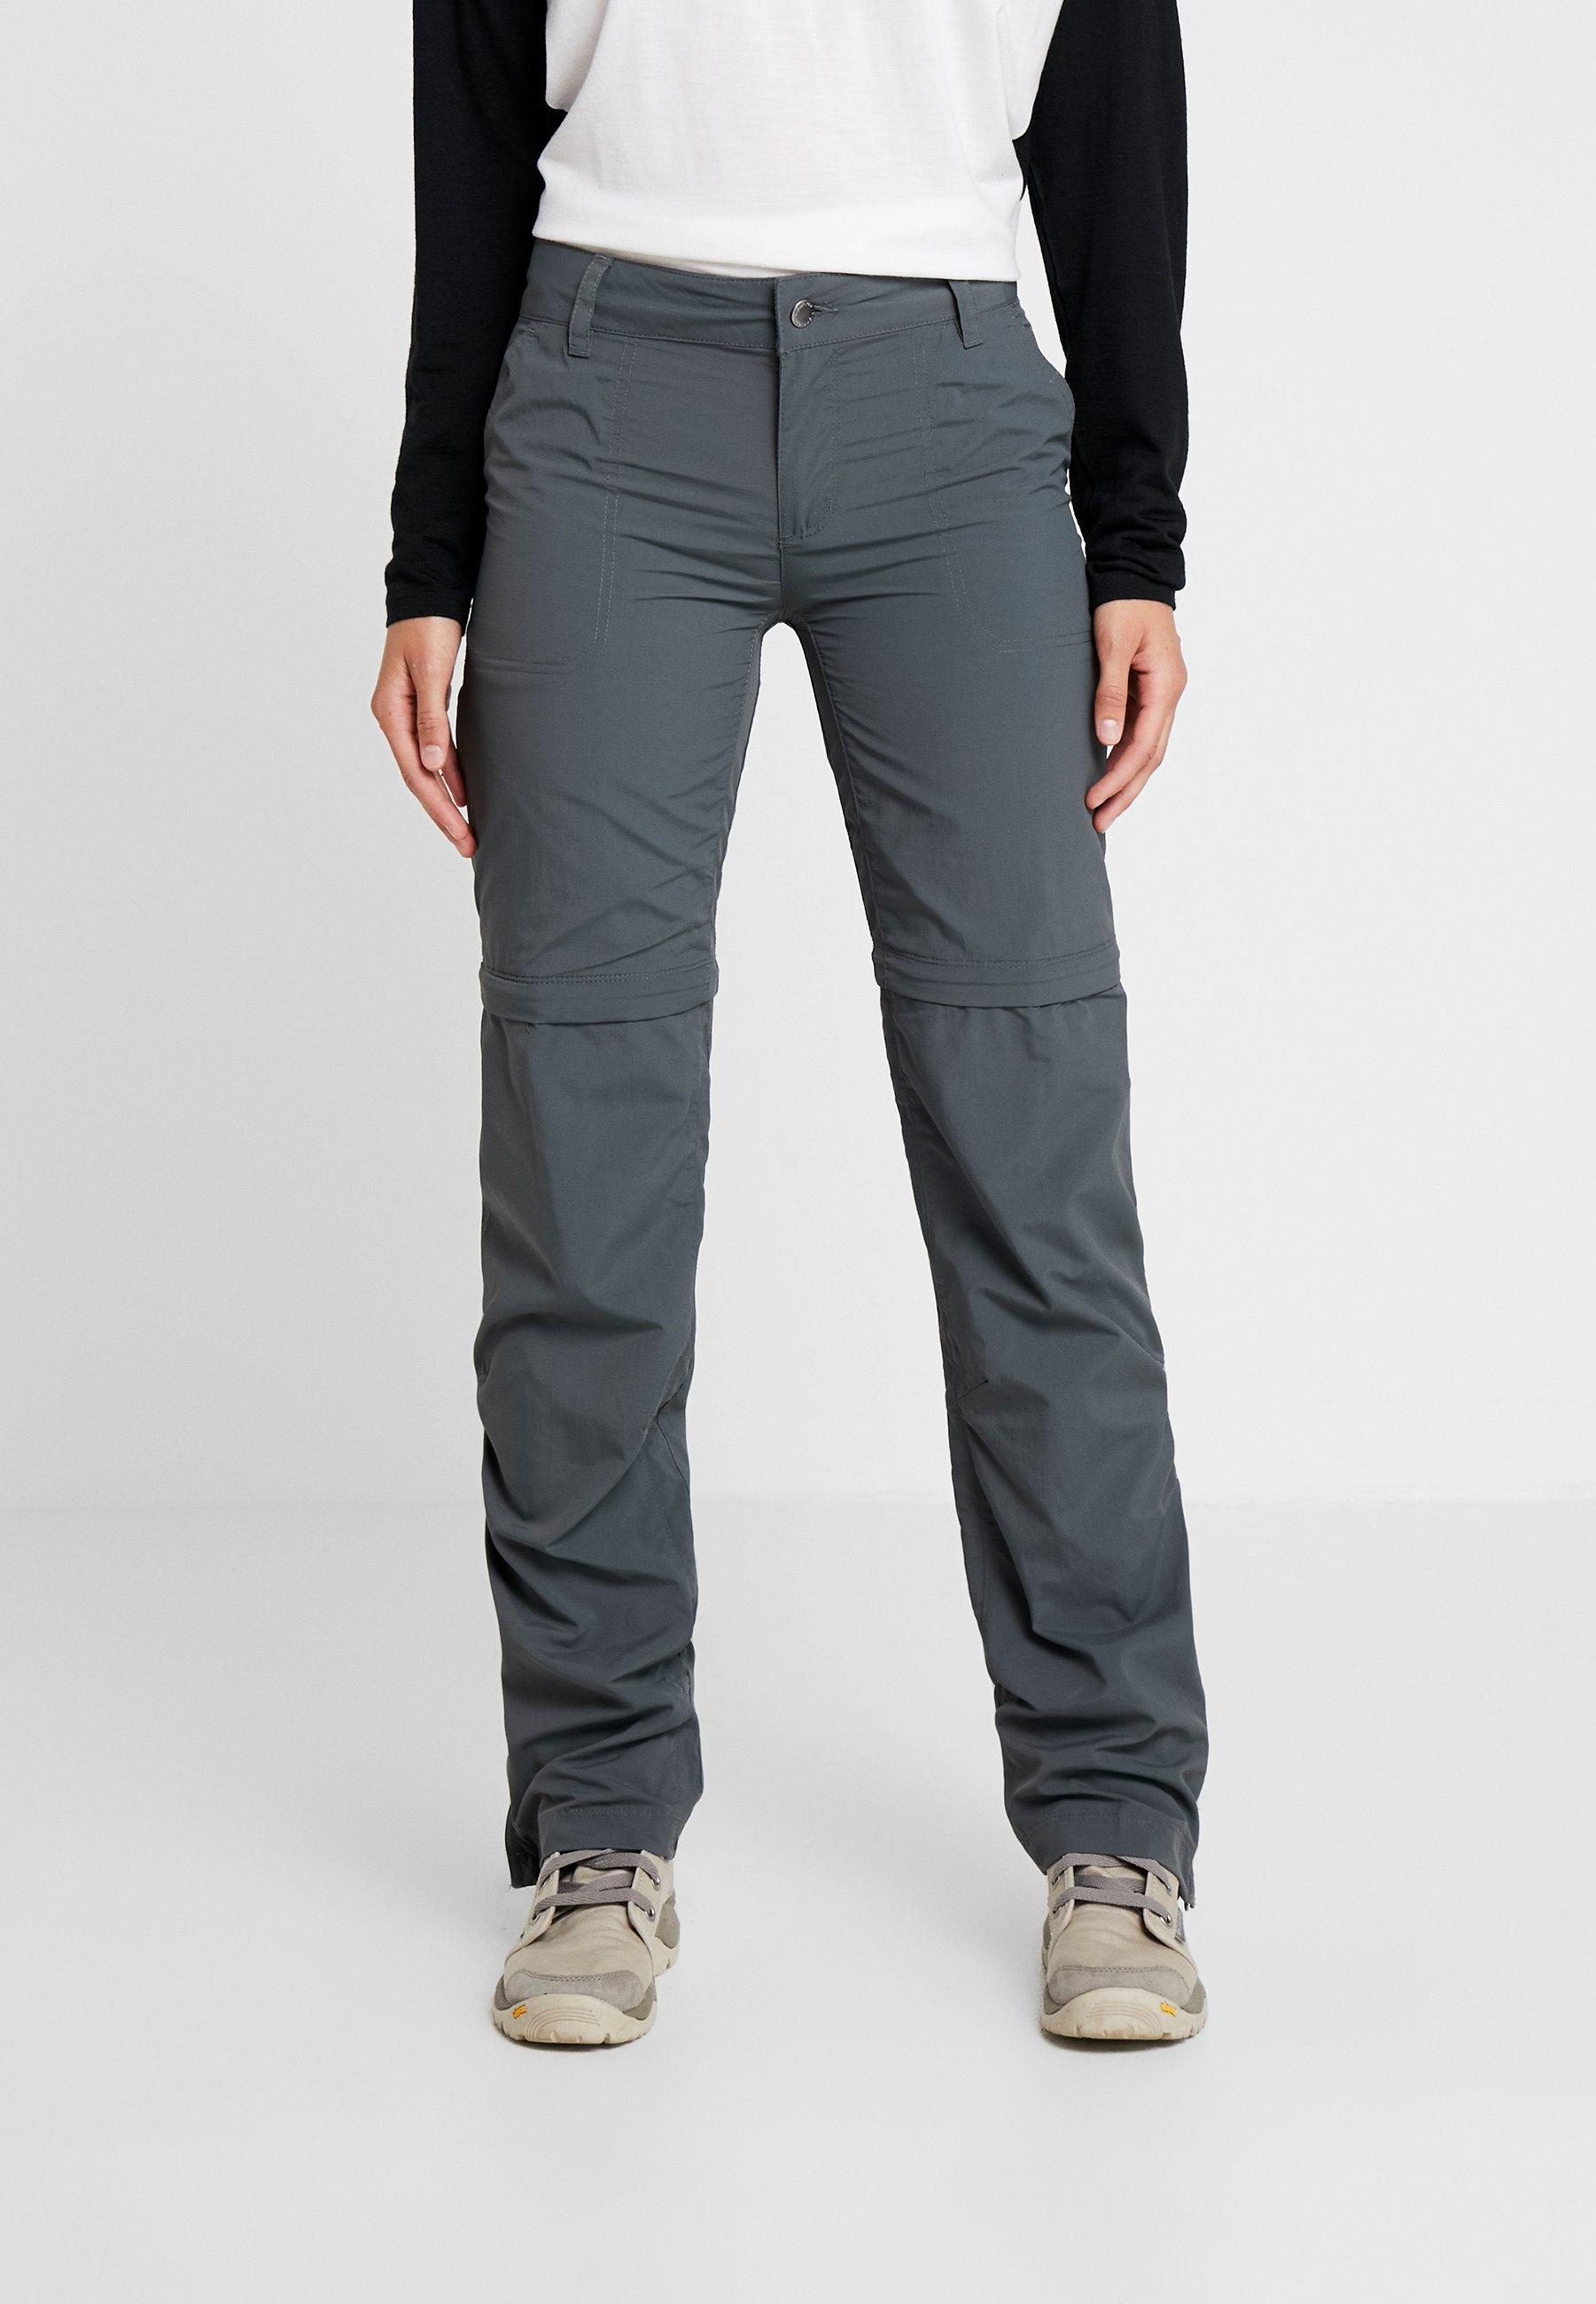 Femme RIDGE 2.0 CONVERTIBLE PANT - Pantalons outdoor